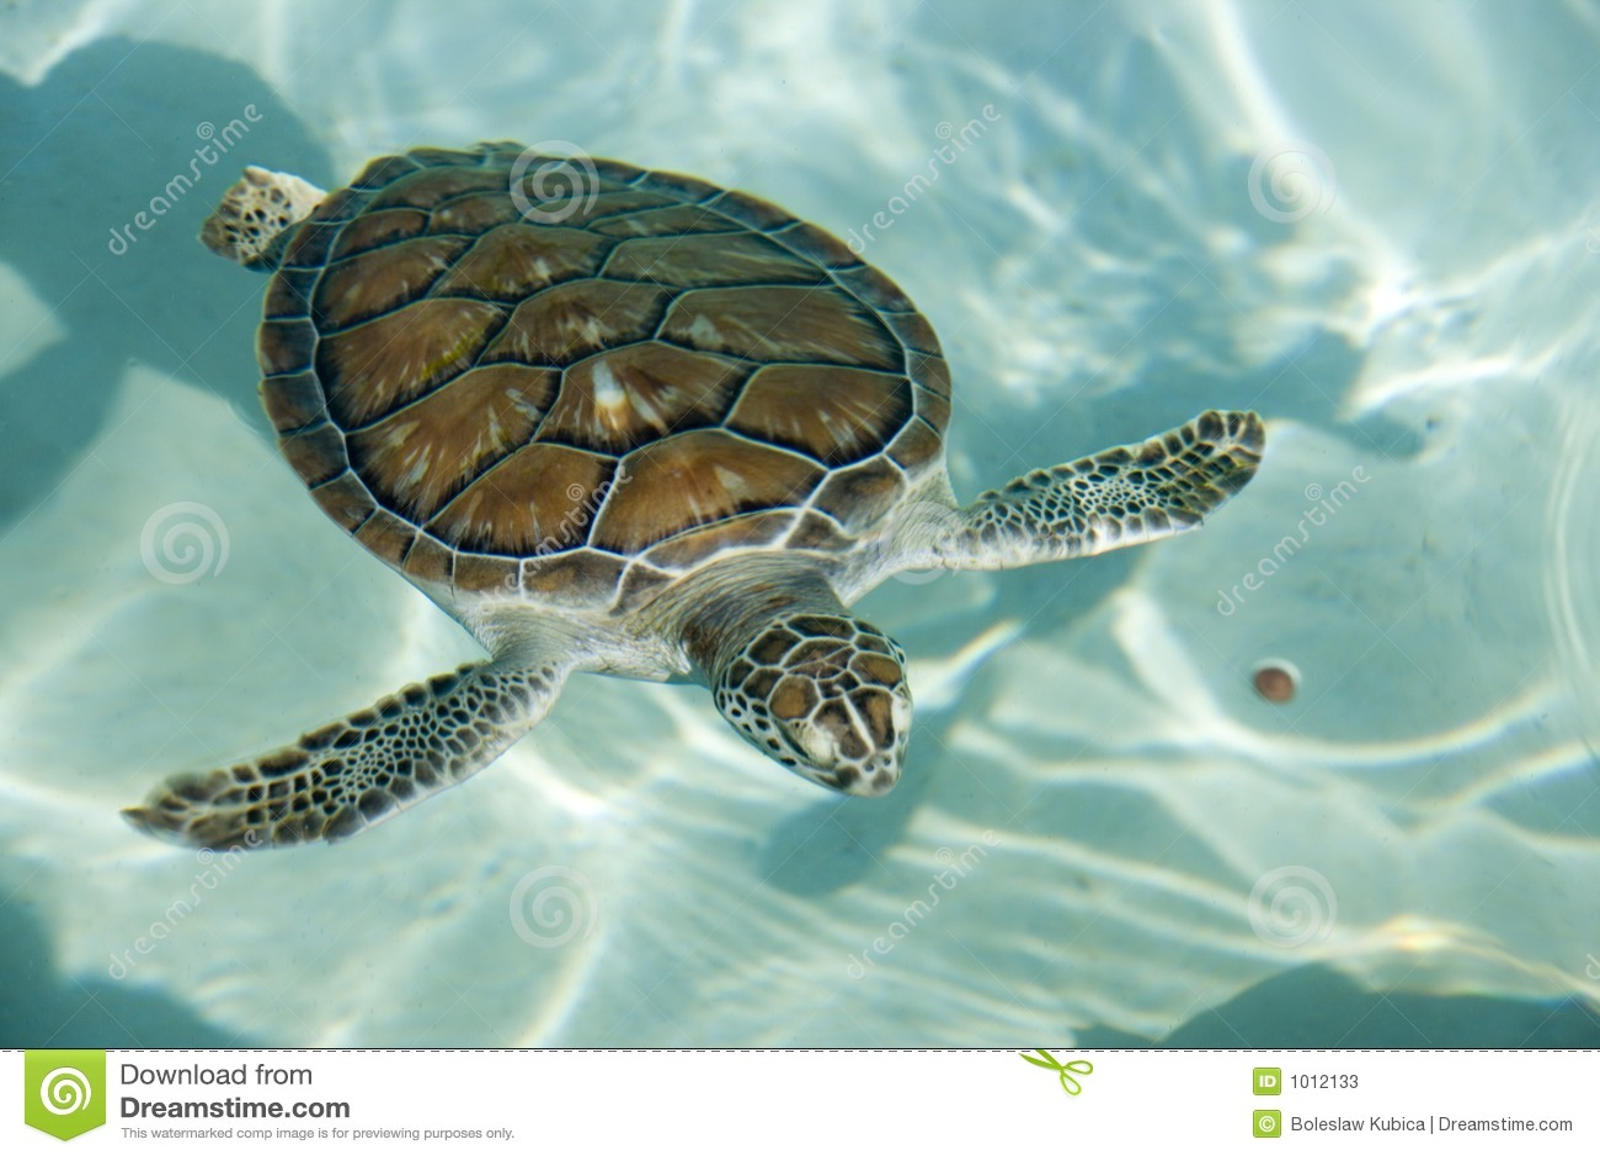 Swimming Tortoise Stock Photos Image 1012133